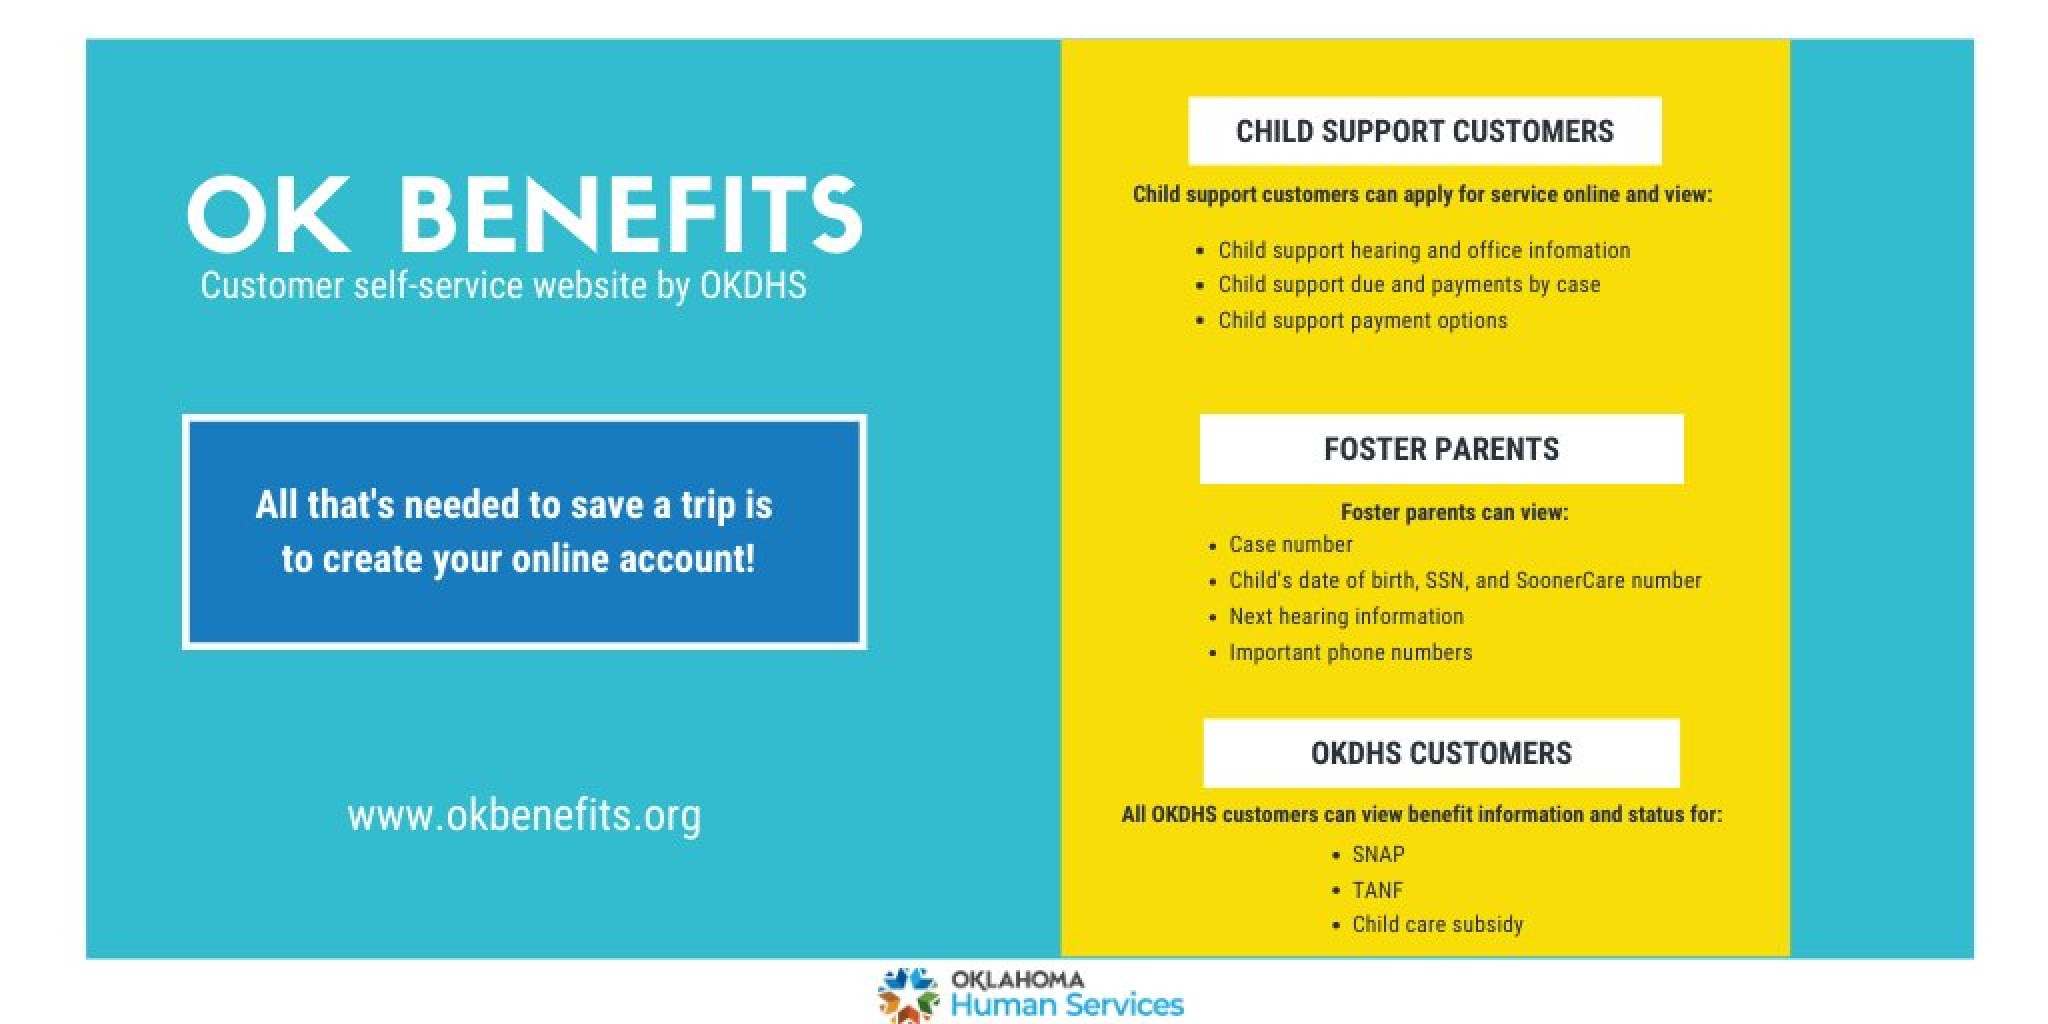 OK Benefits se expande para apoyar mejor a las familias adoptivas